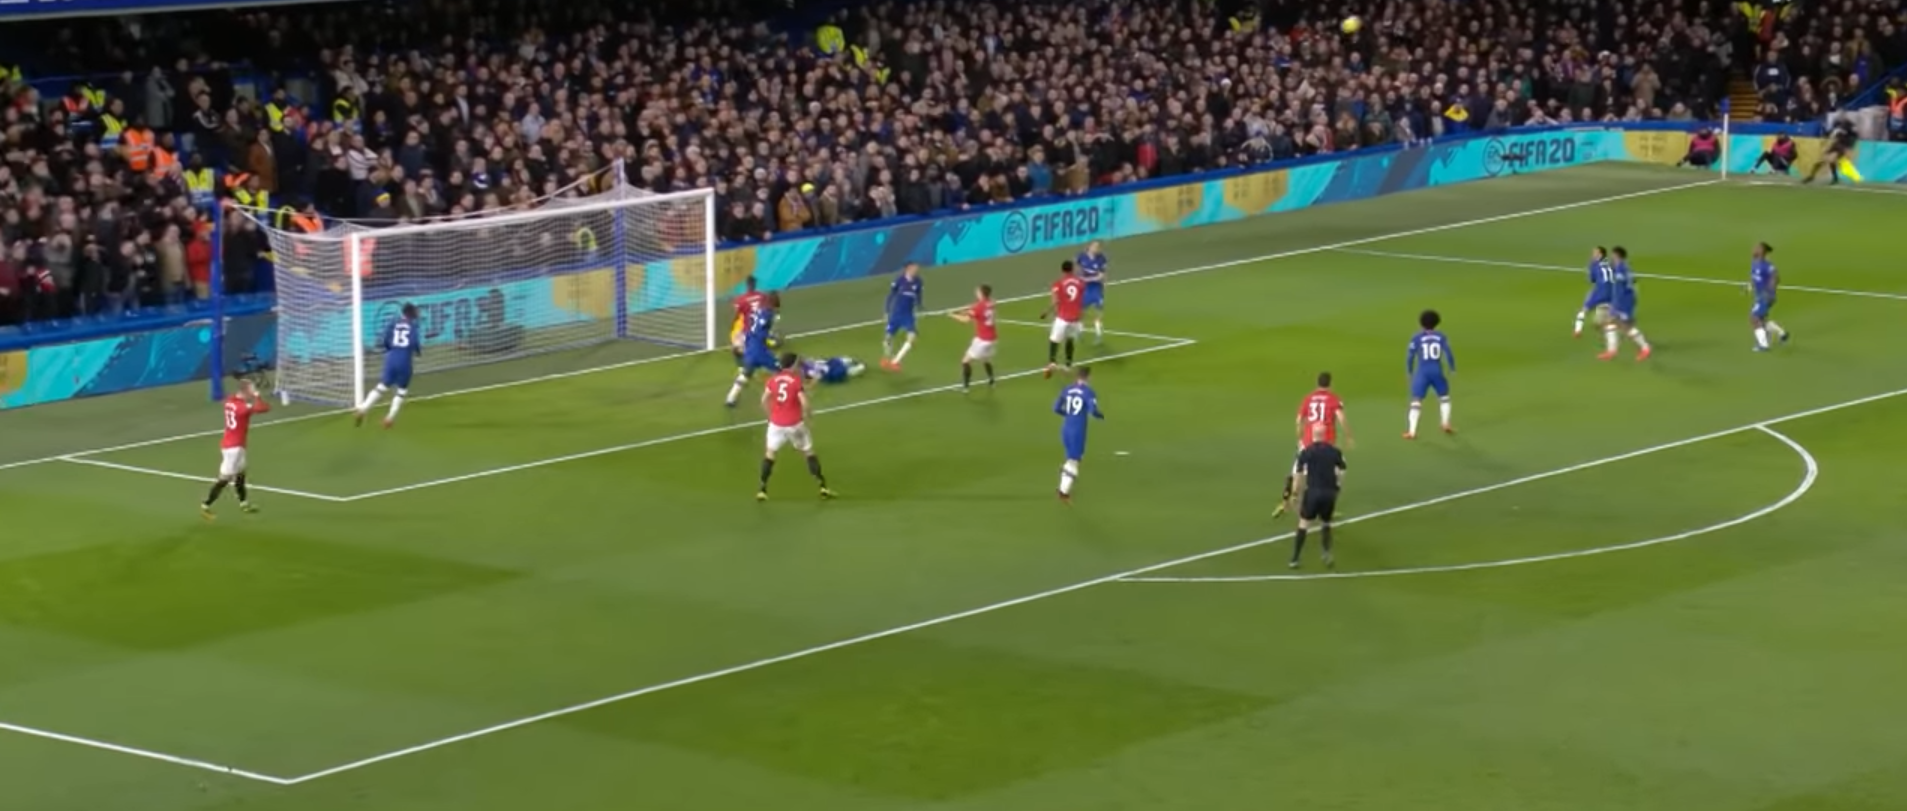 Manchester United vs Chelsea Head to Head